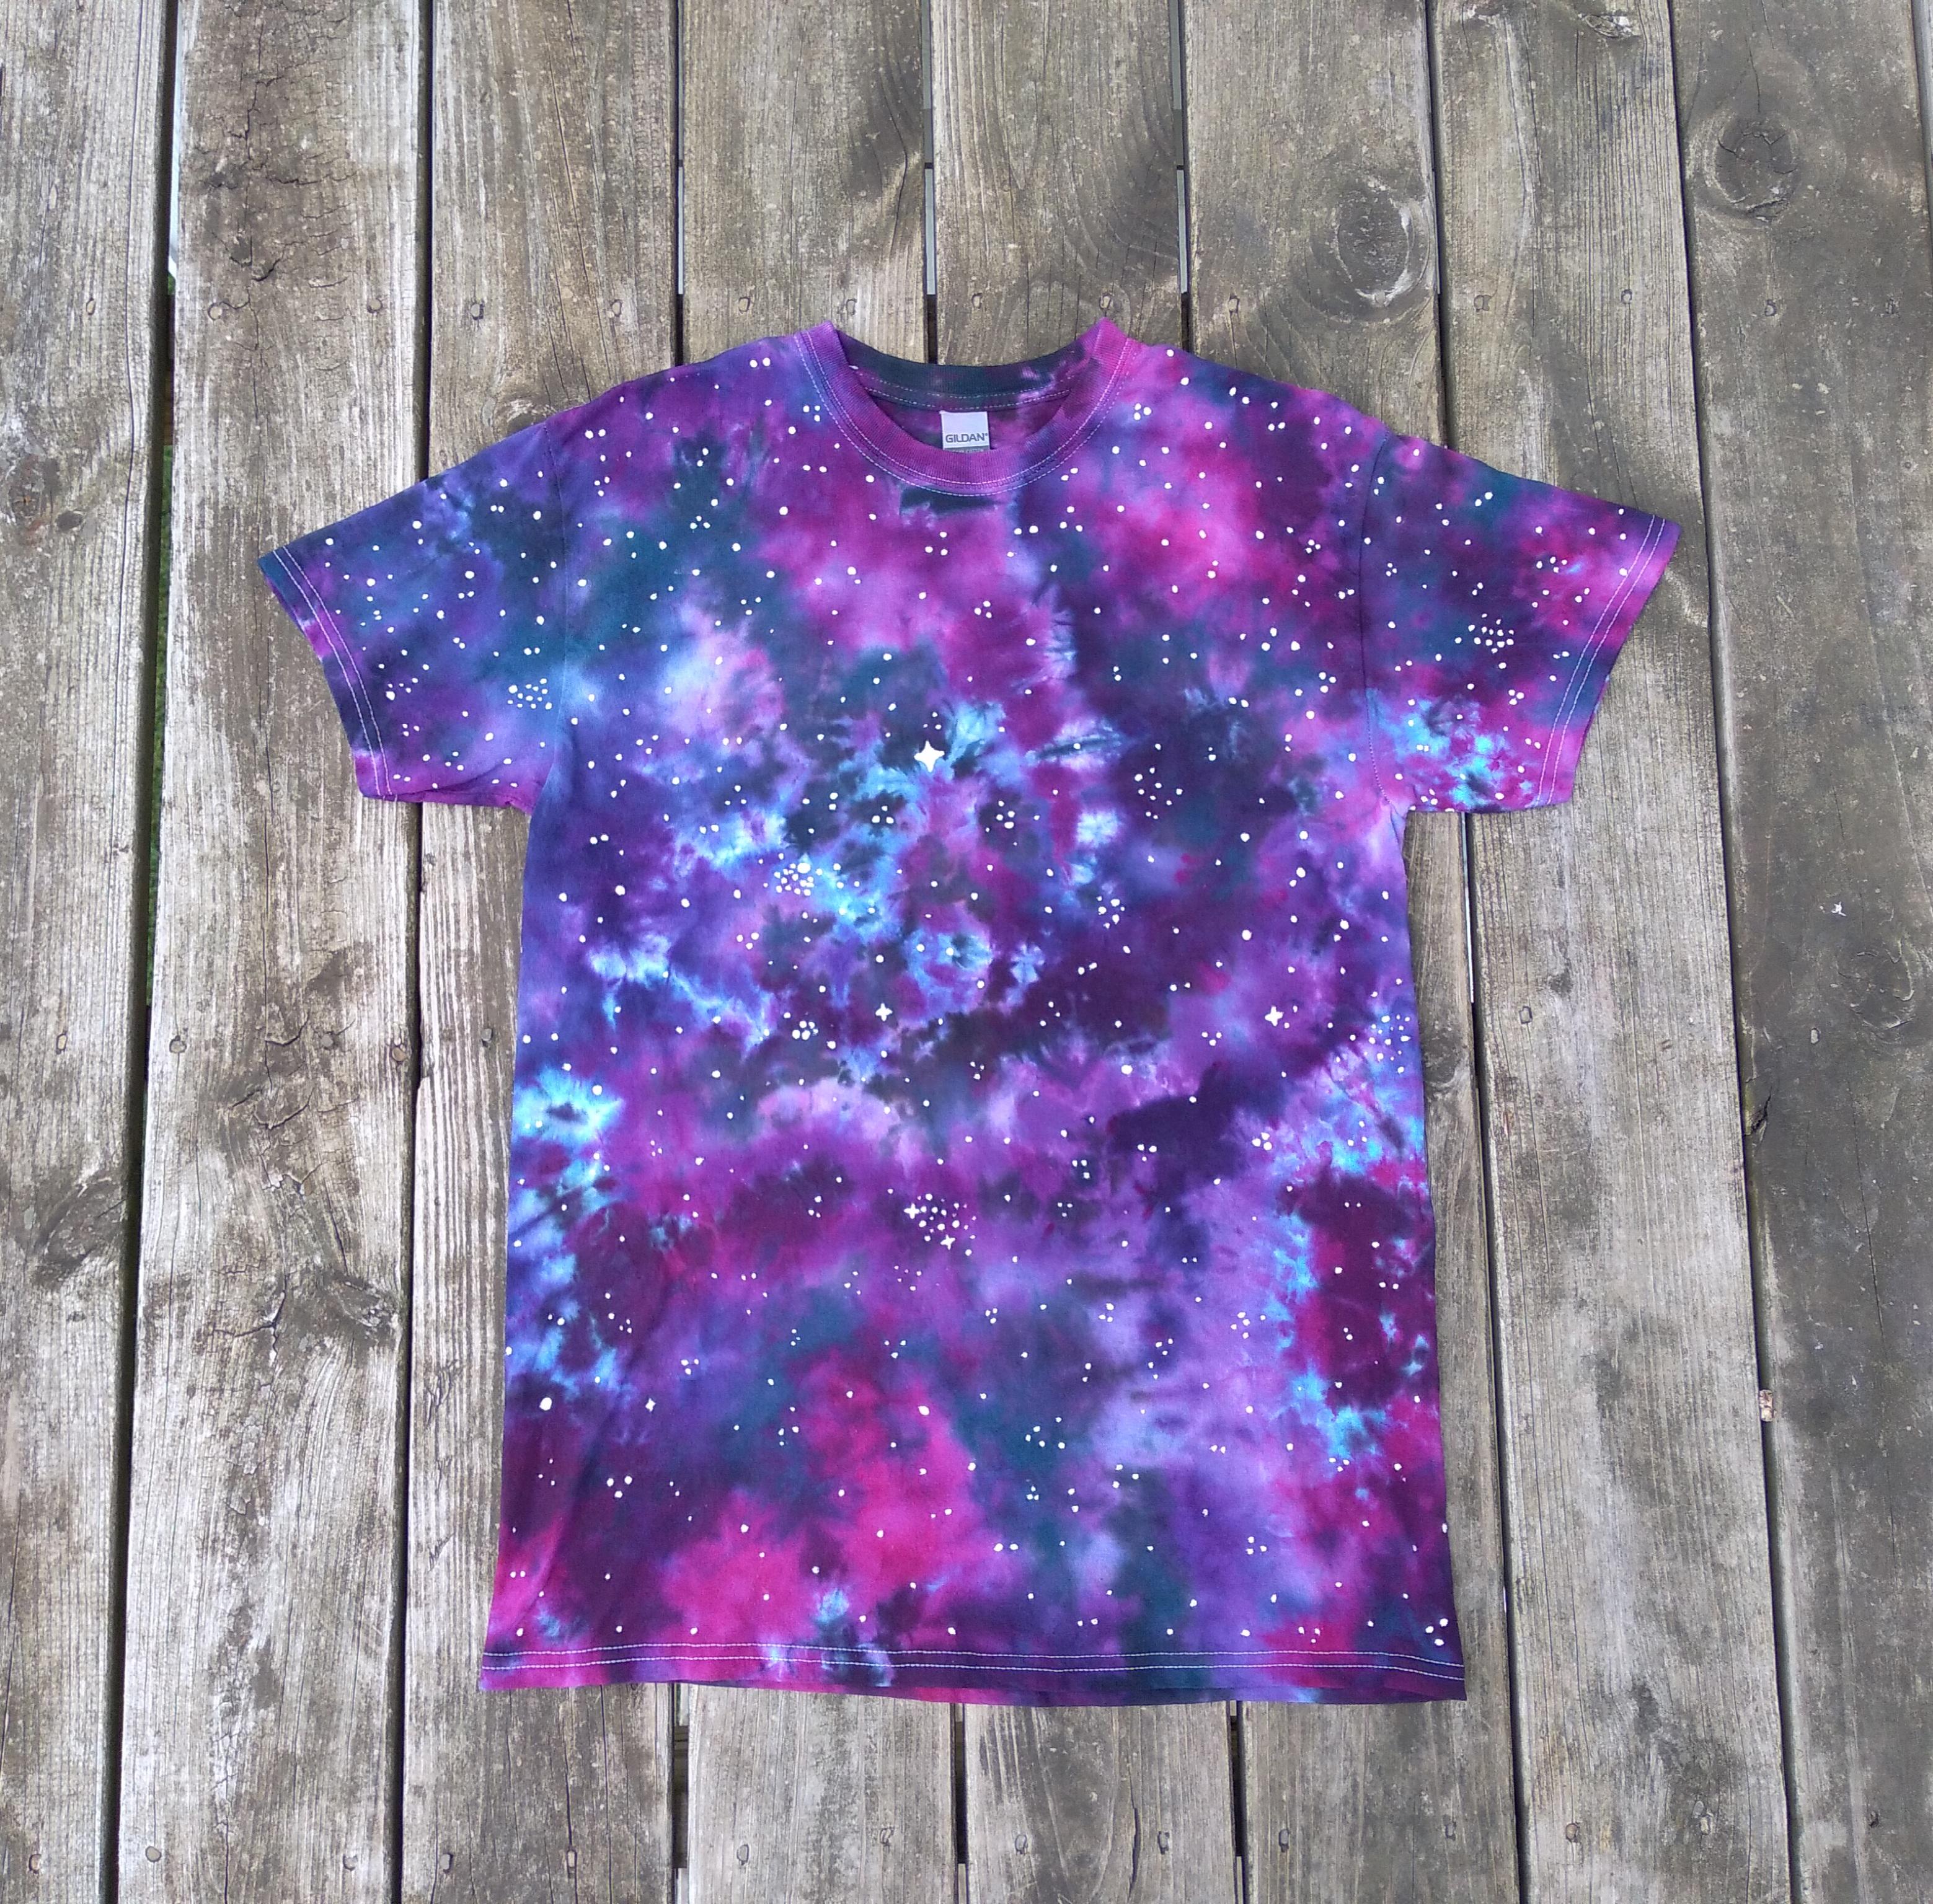 Galaxy/space themed t-shirt